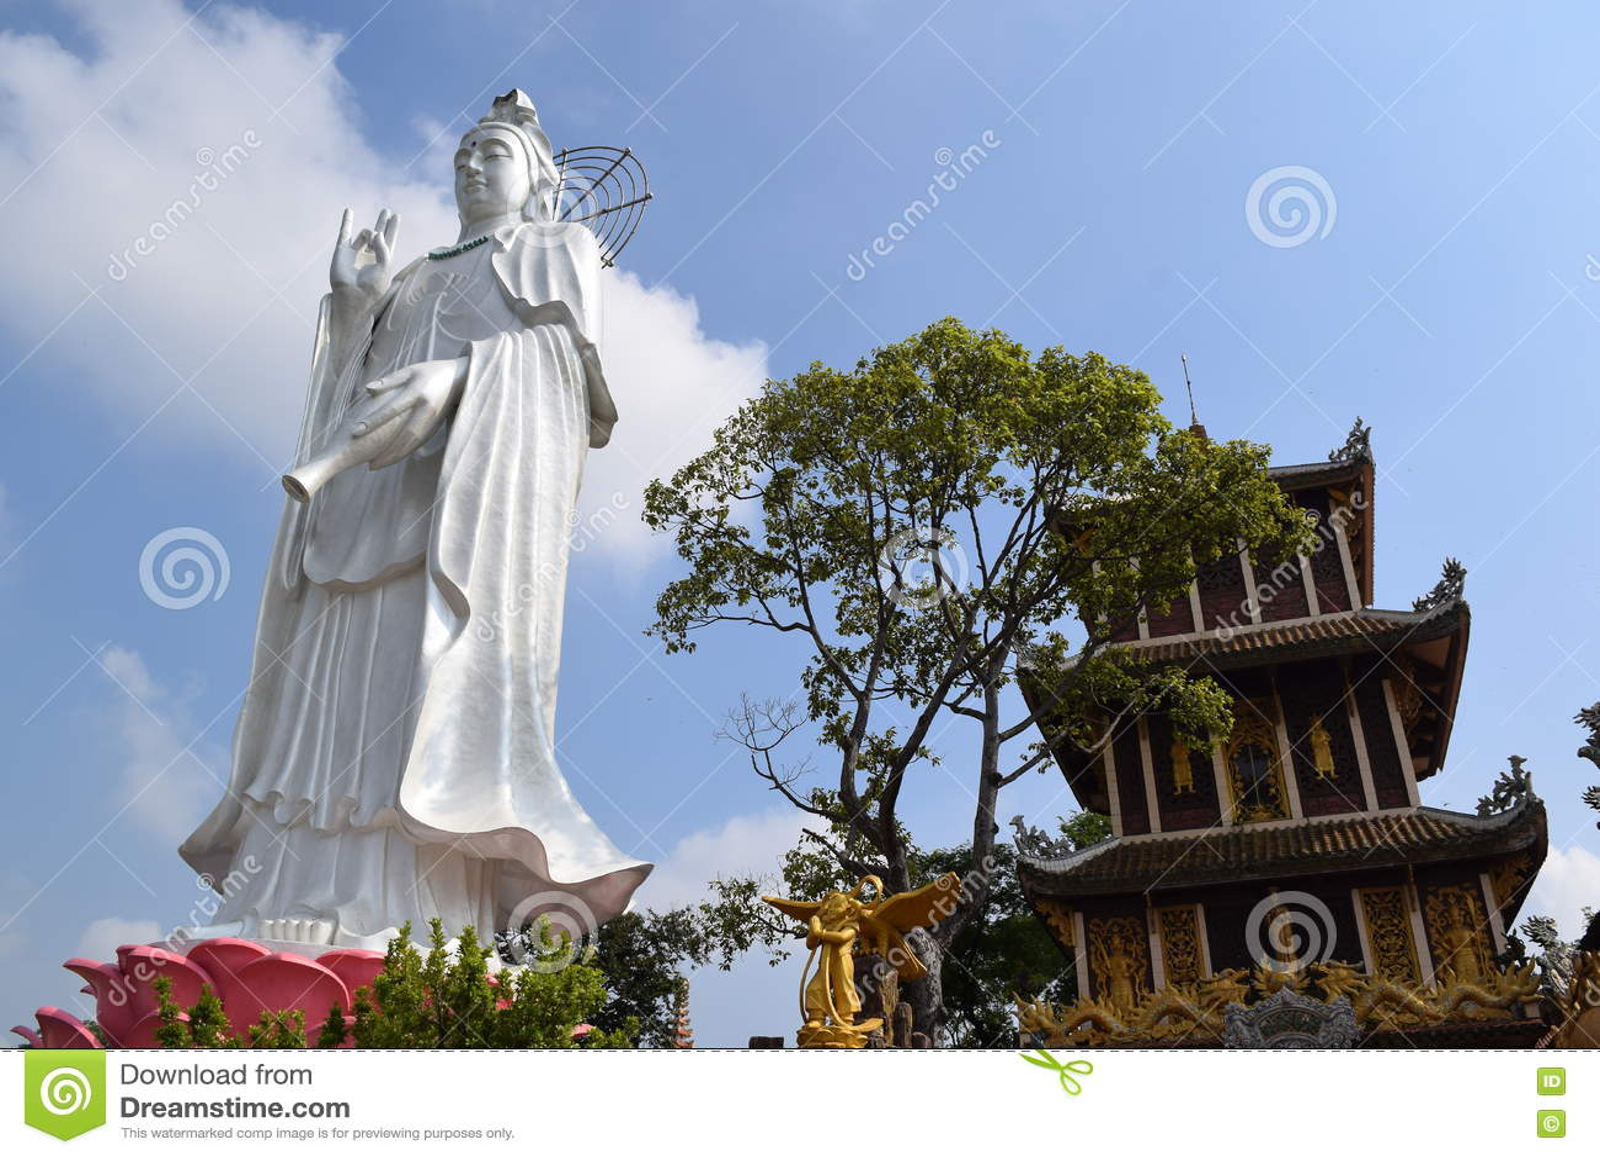 Estátua grande do Bodhisattva no templo budista de Chau Thoi, Binh Duo